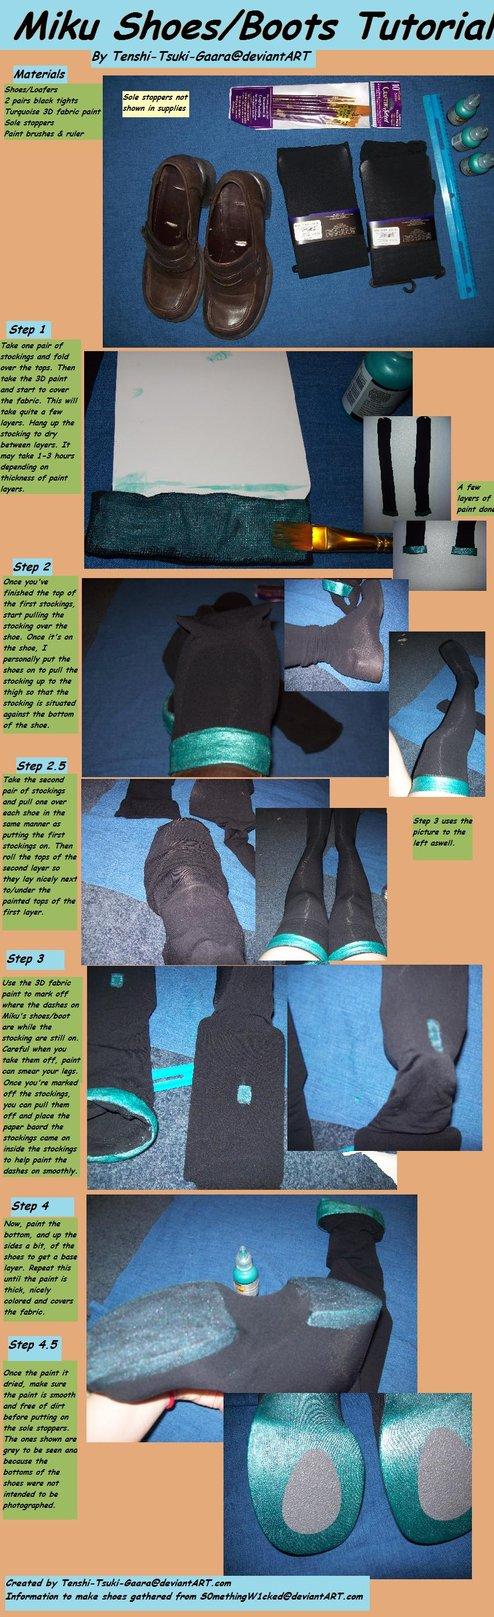 Miku Shoes Tutorial by Tenshi-Tsuki-Gaara on DeviantArt